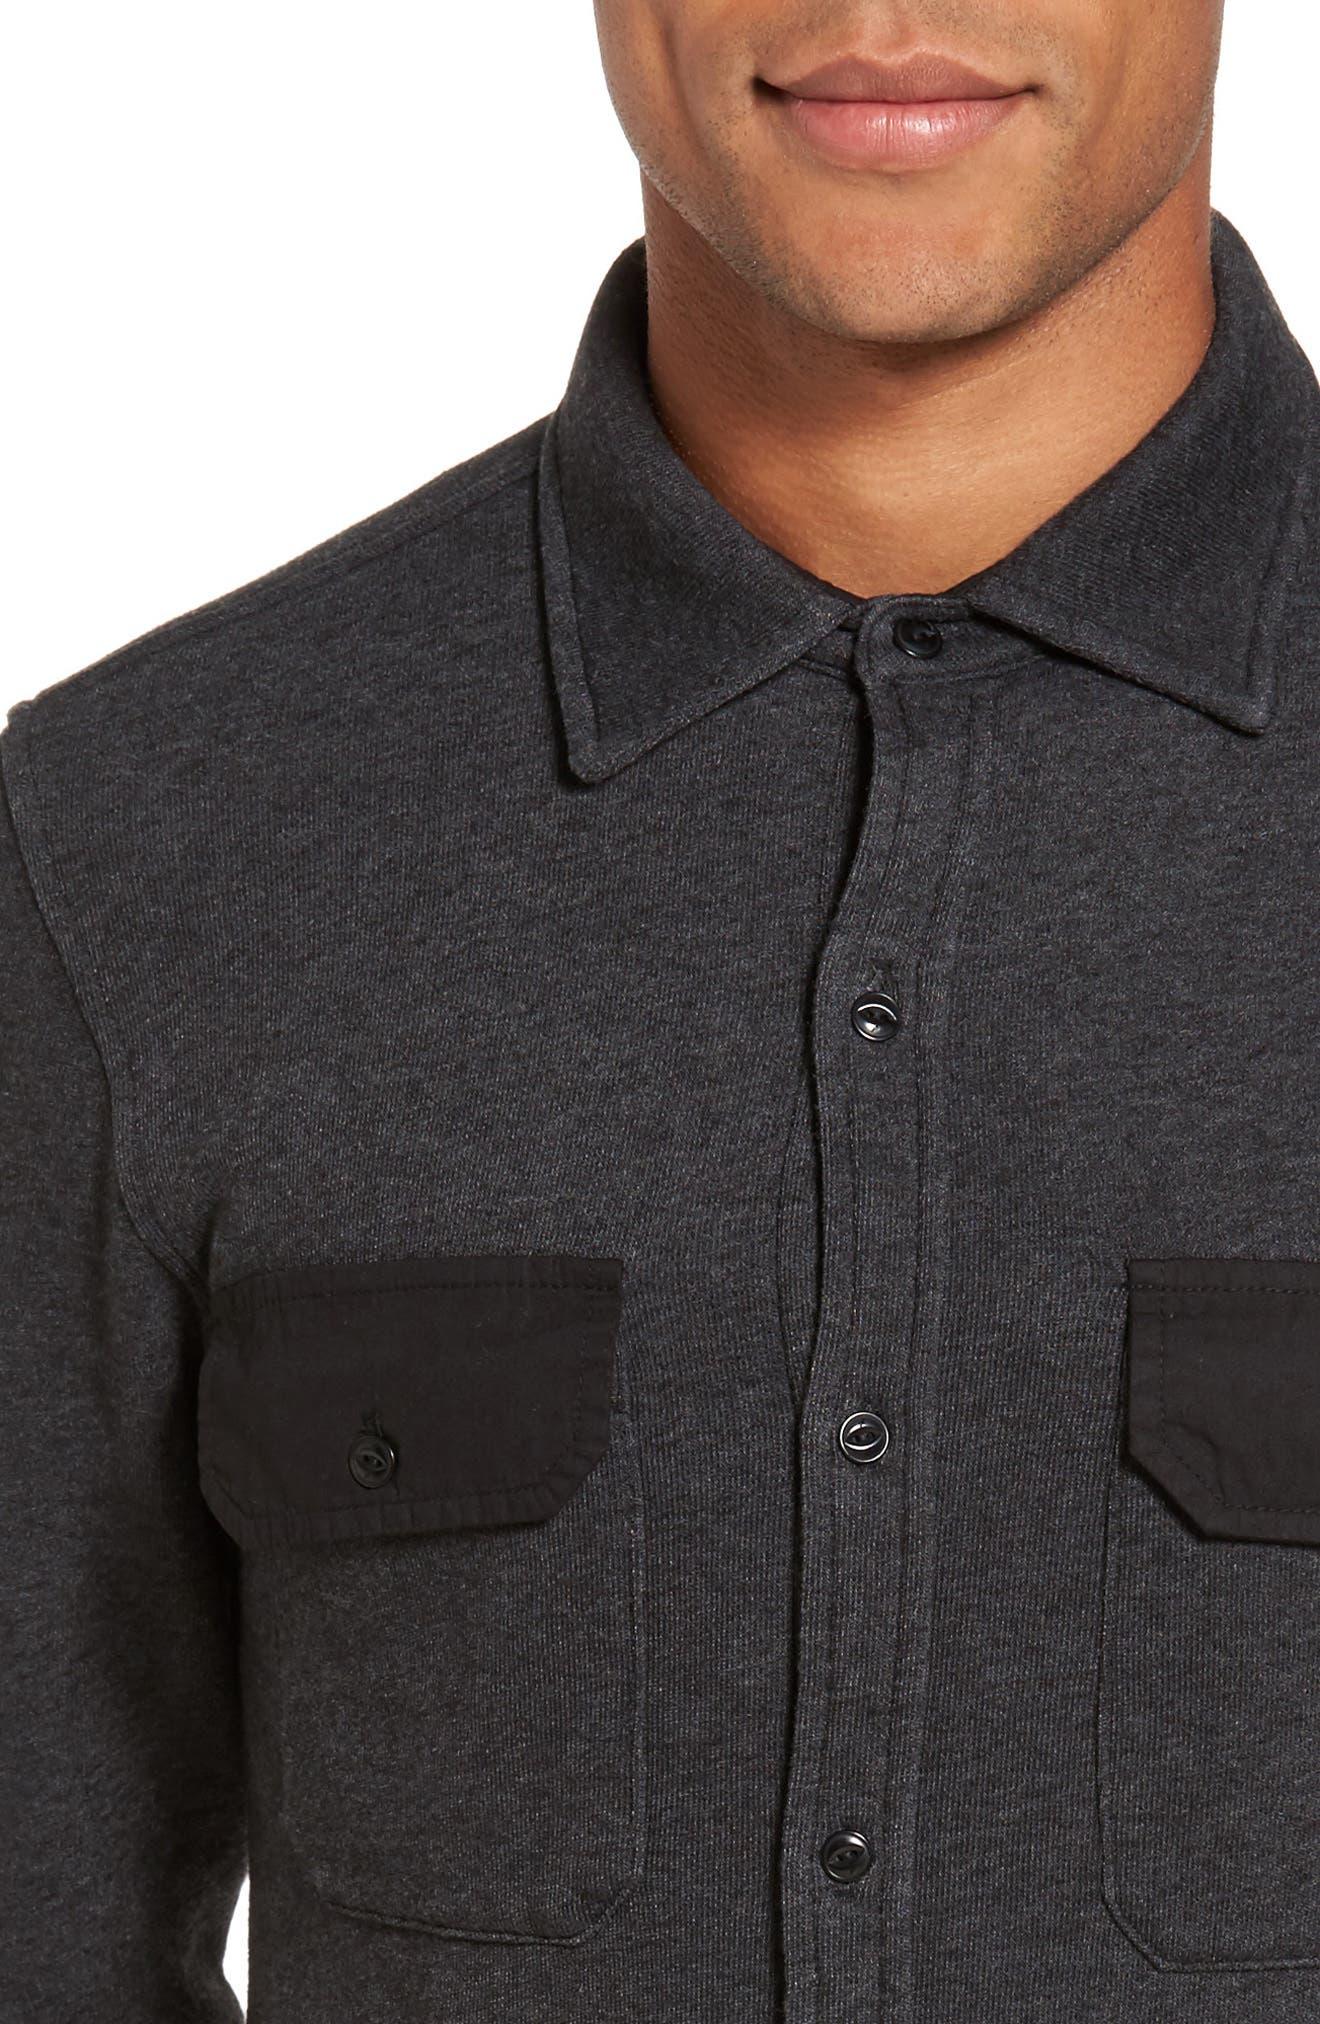 Shirt Jacket,                             Alternate thumbnail 4, color,                             Black